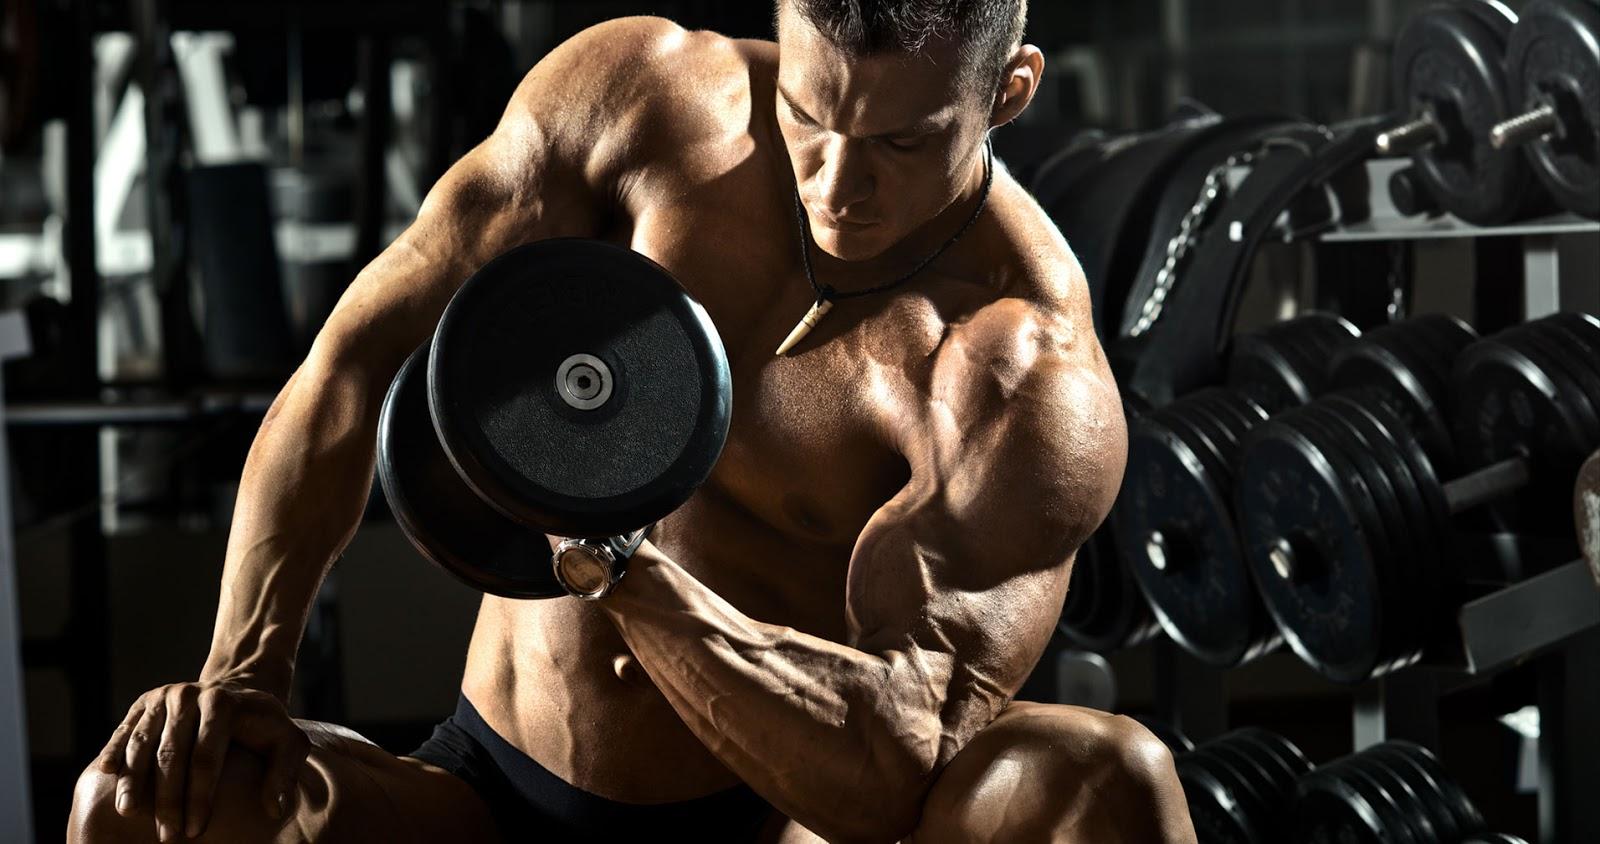 bodybuilding-contests-training.jpg